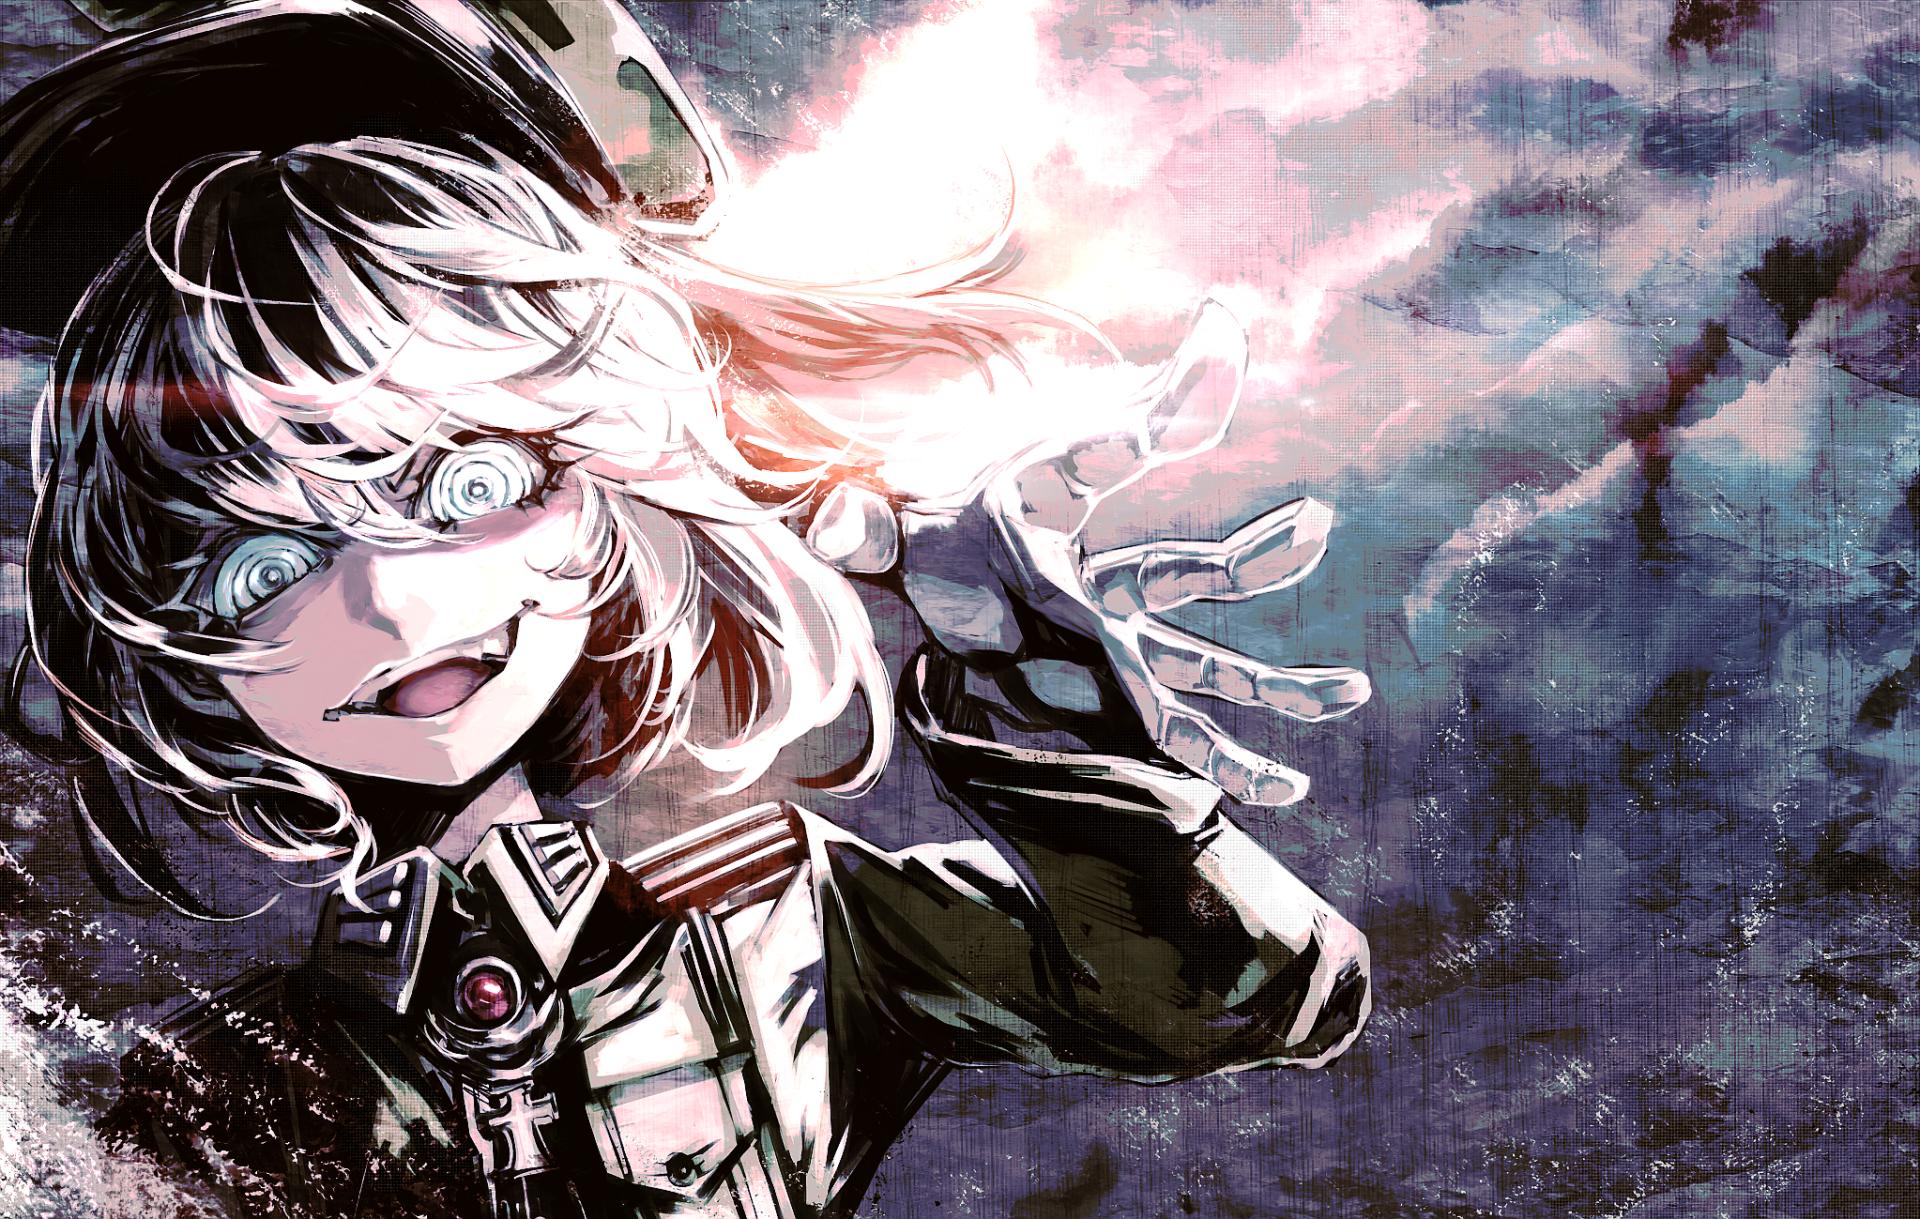 Anime - Youjo Senki  Tanya Degurechaff Wallpaper